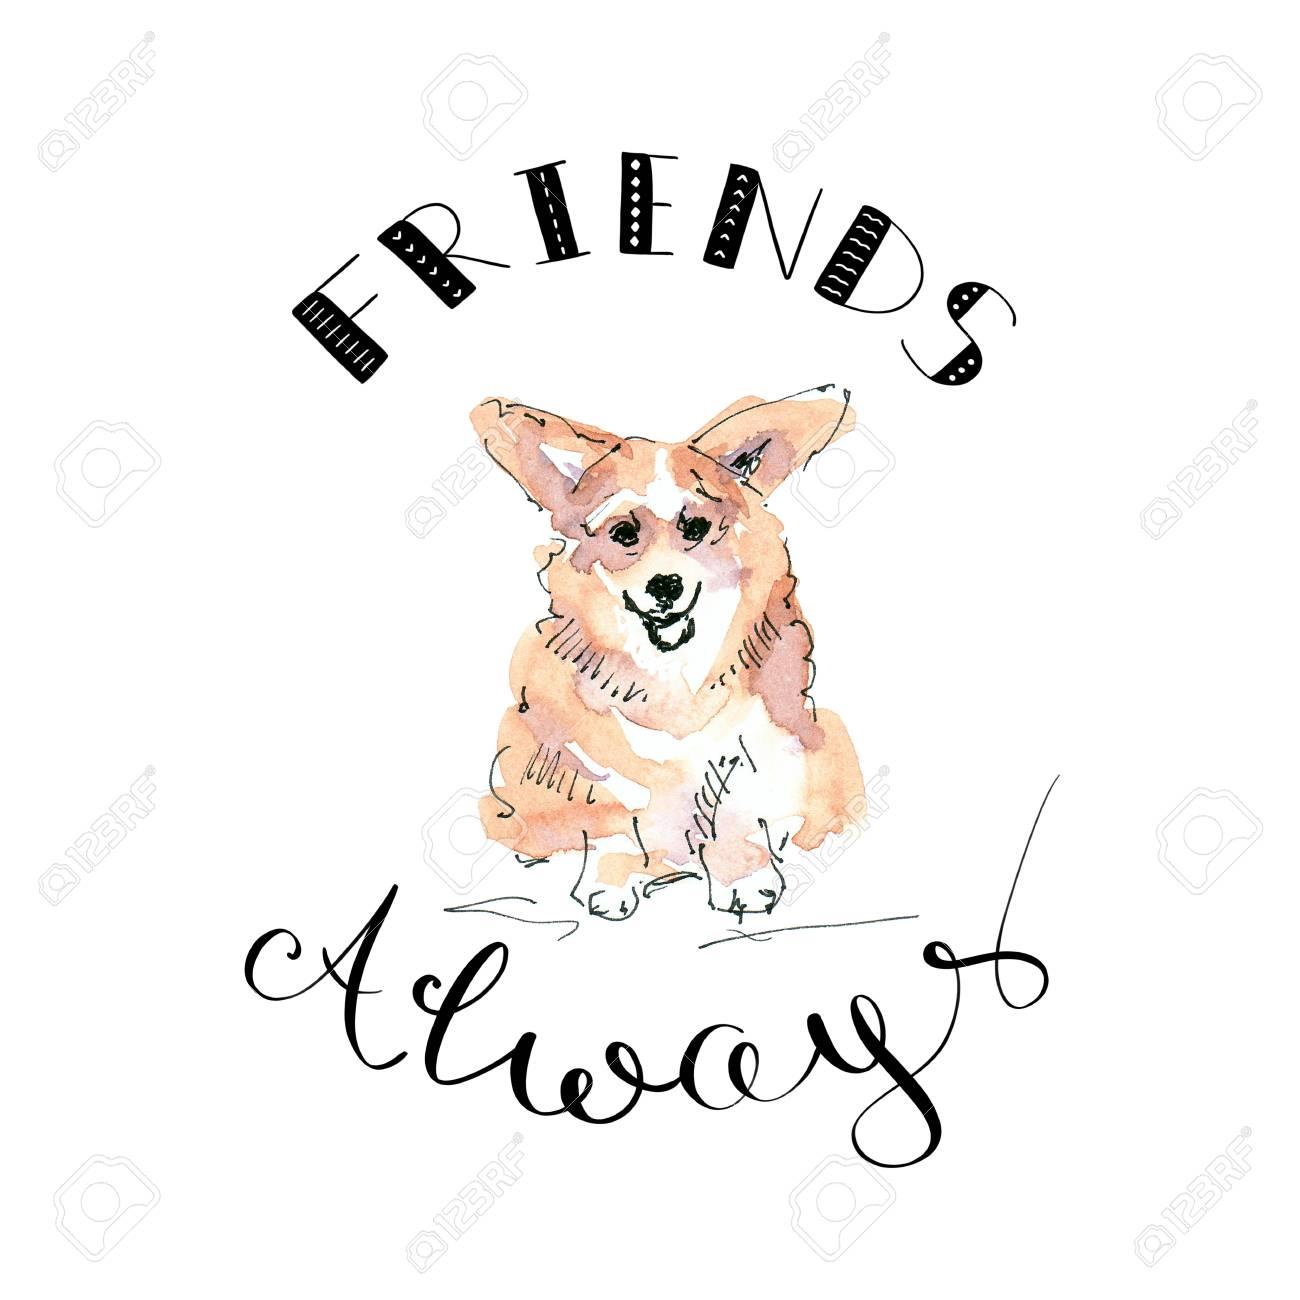 Illustration of Corgi dog with lettering friends always - 109991124